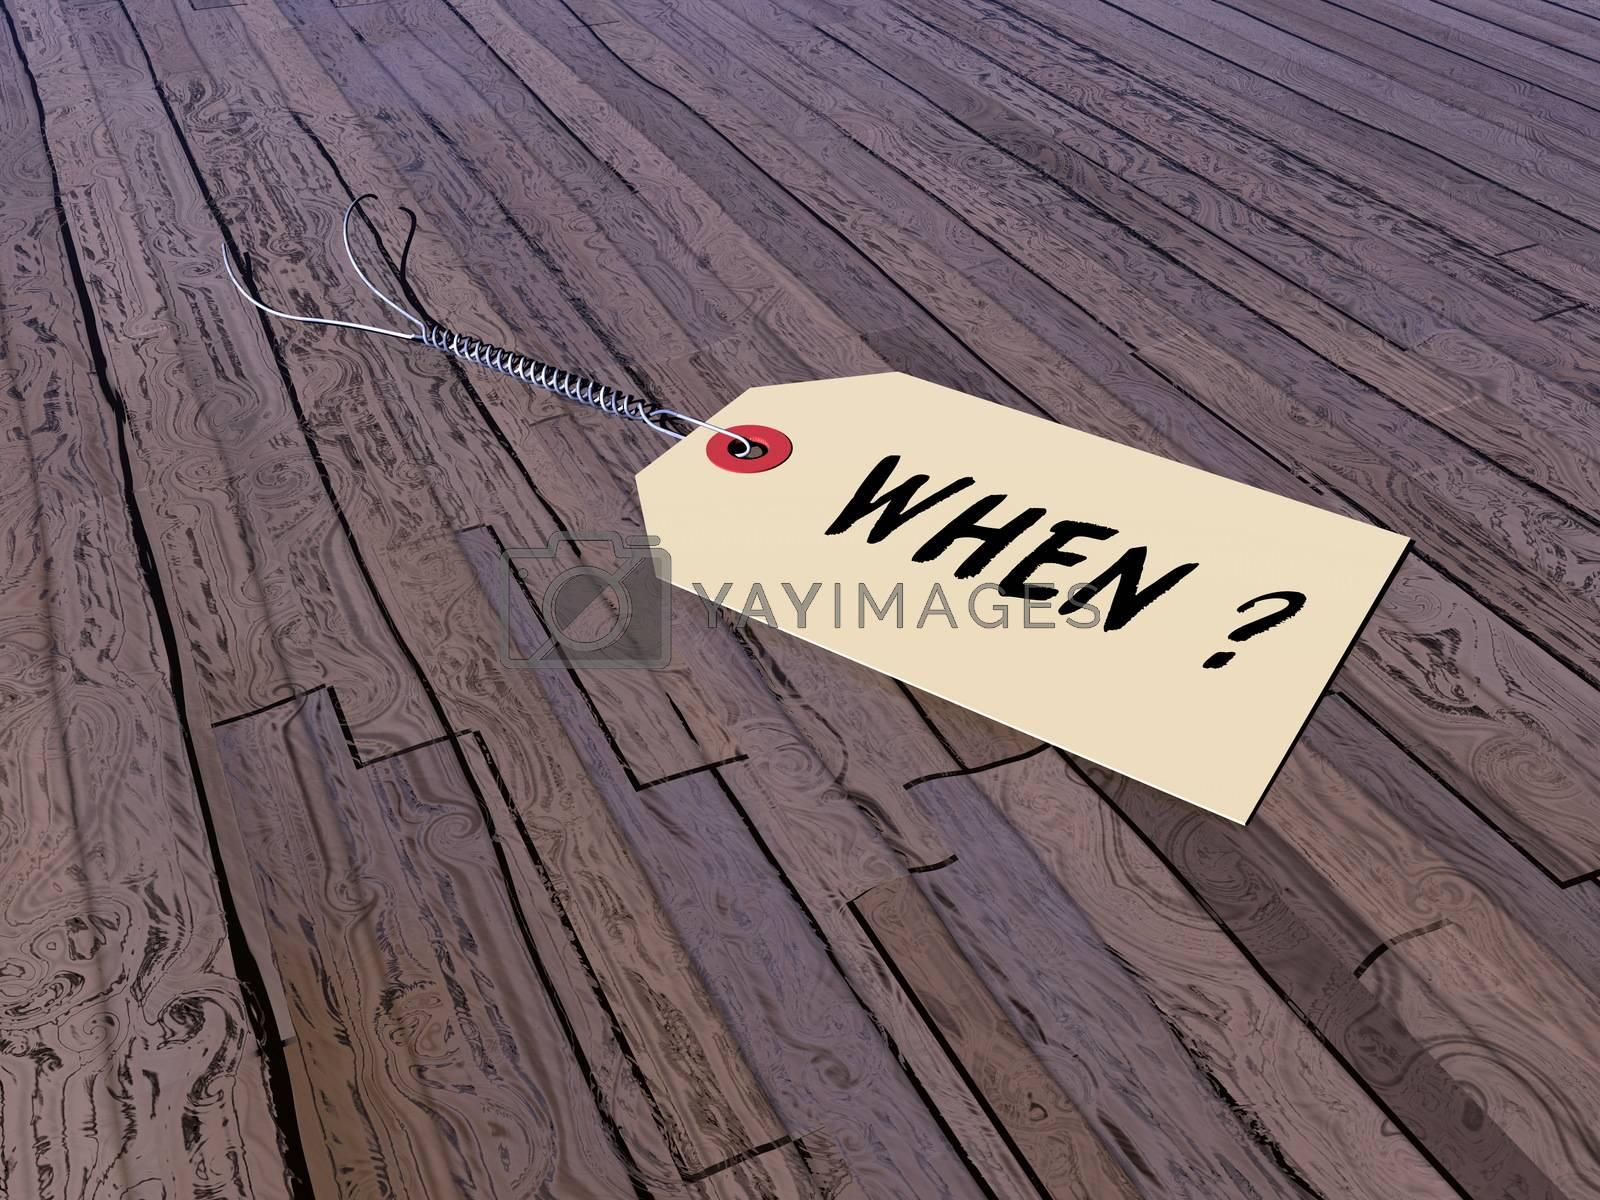 Tag asking when on a vintage wooden floor - 3D render